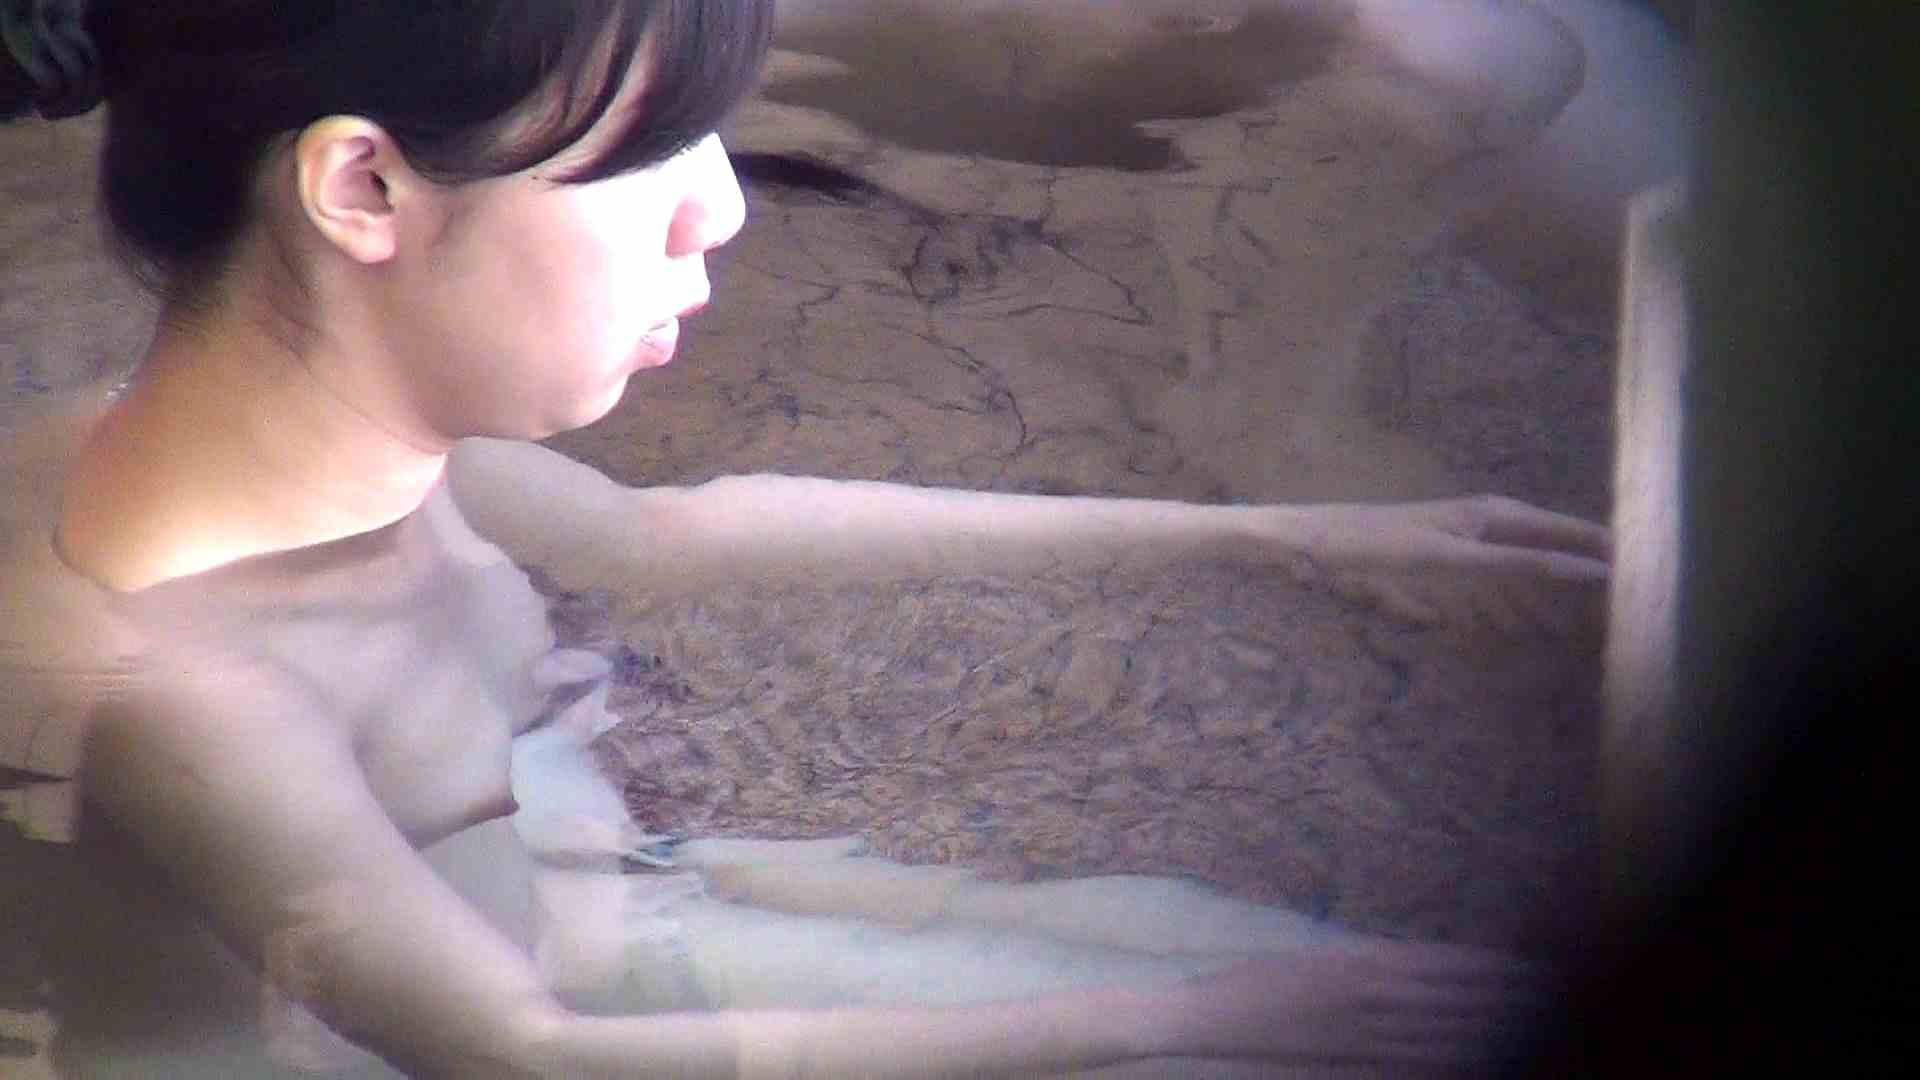 Aquaな露天風呂Vol.285 盗撮 おめこ無修正画像 24連発 23